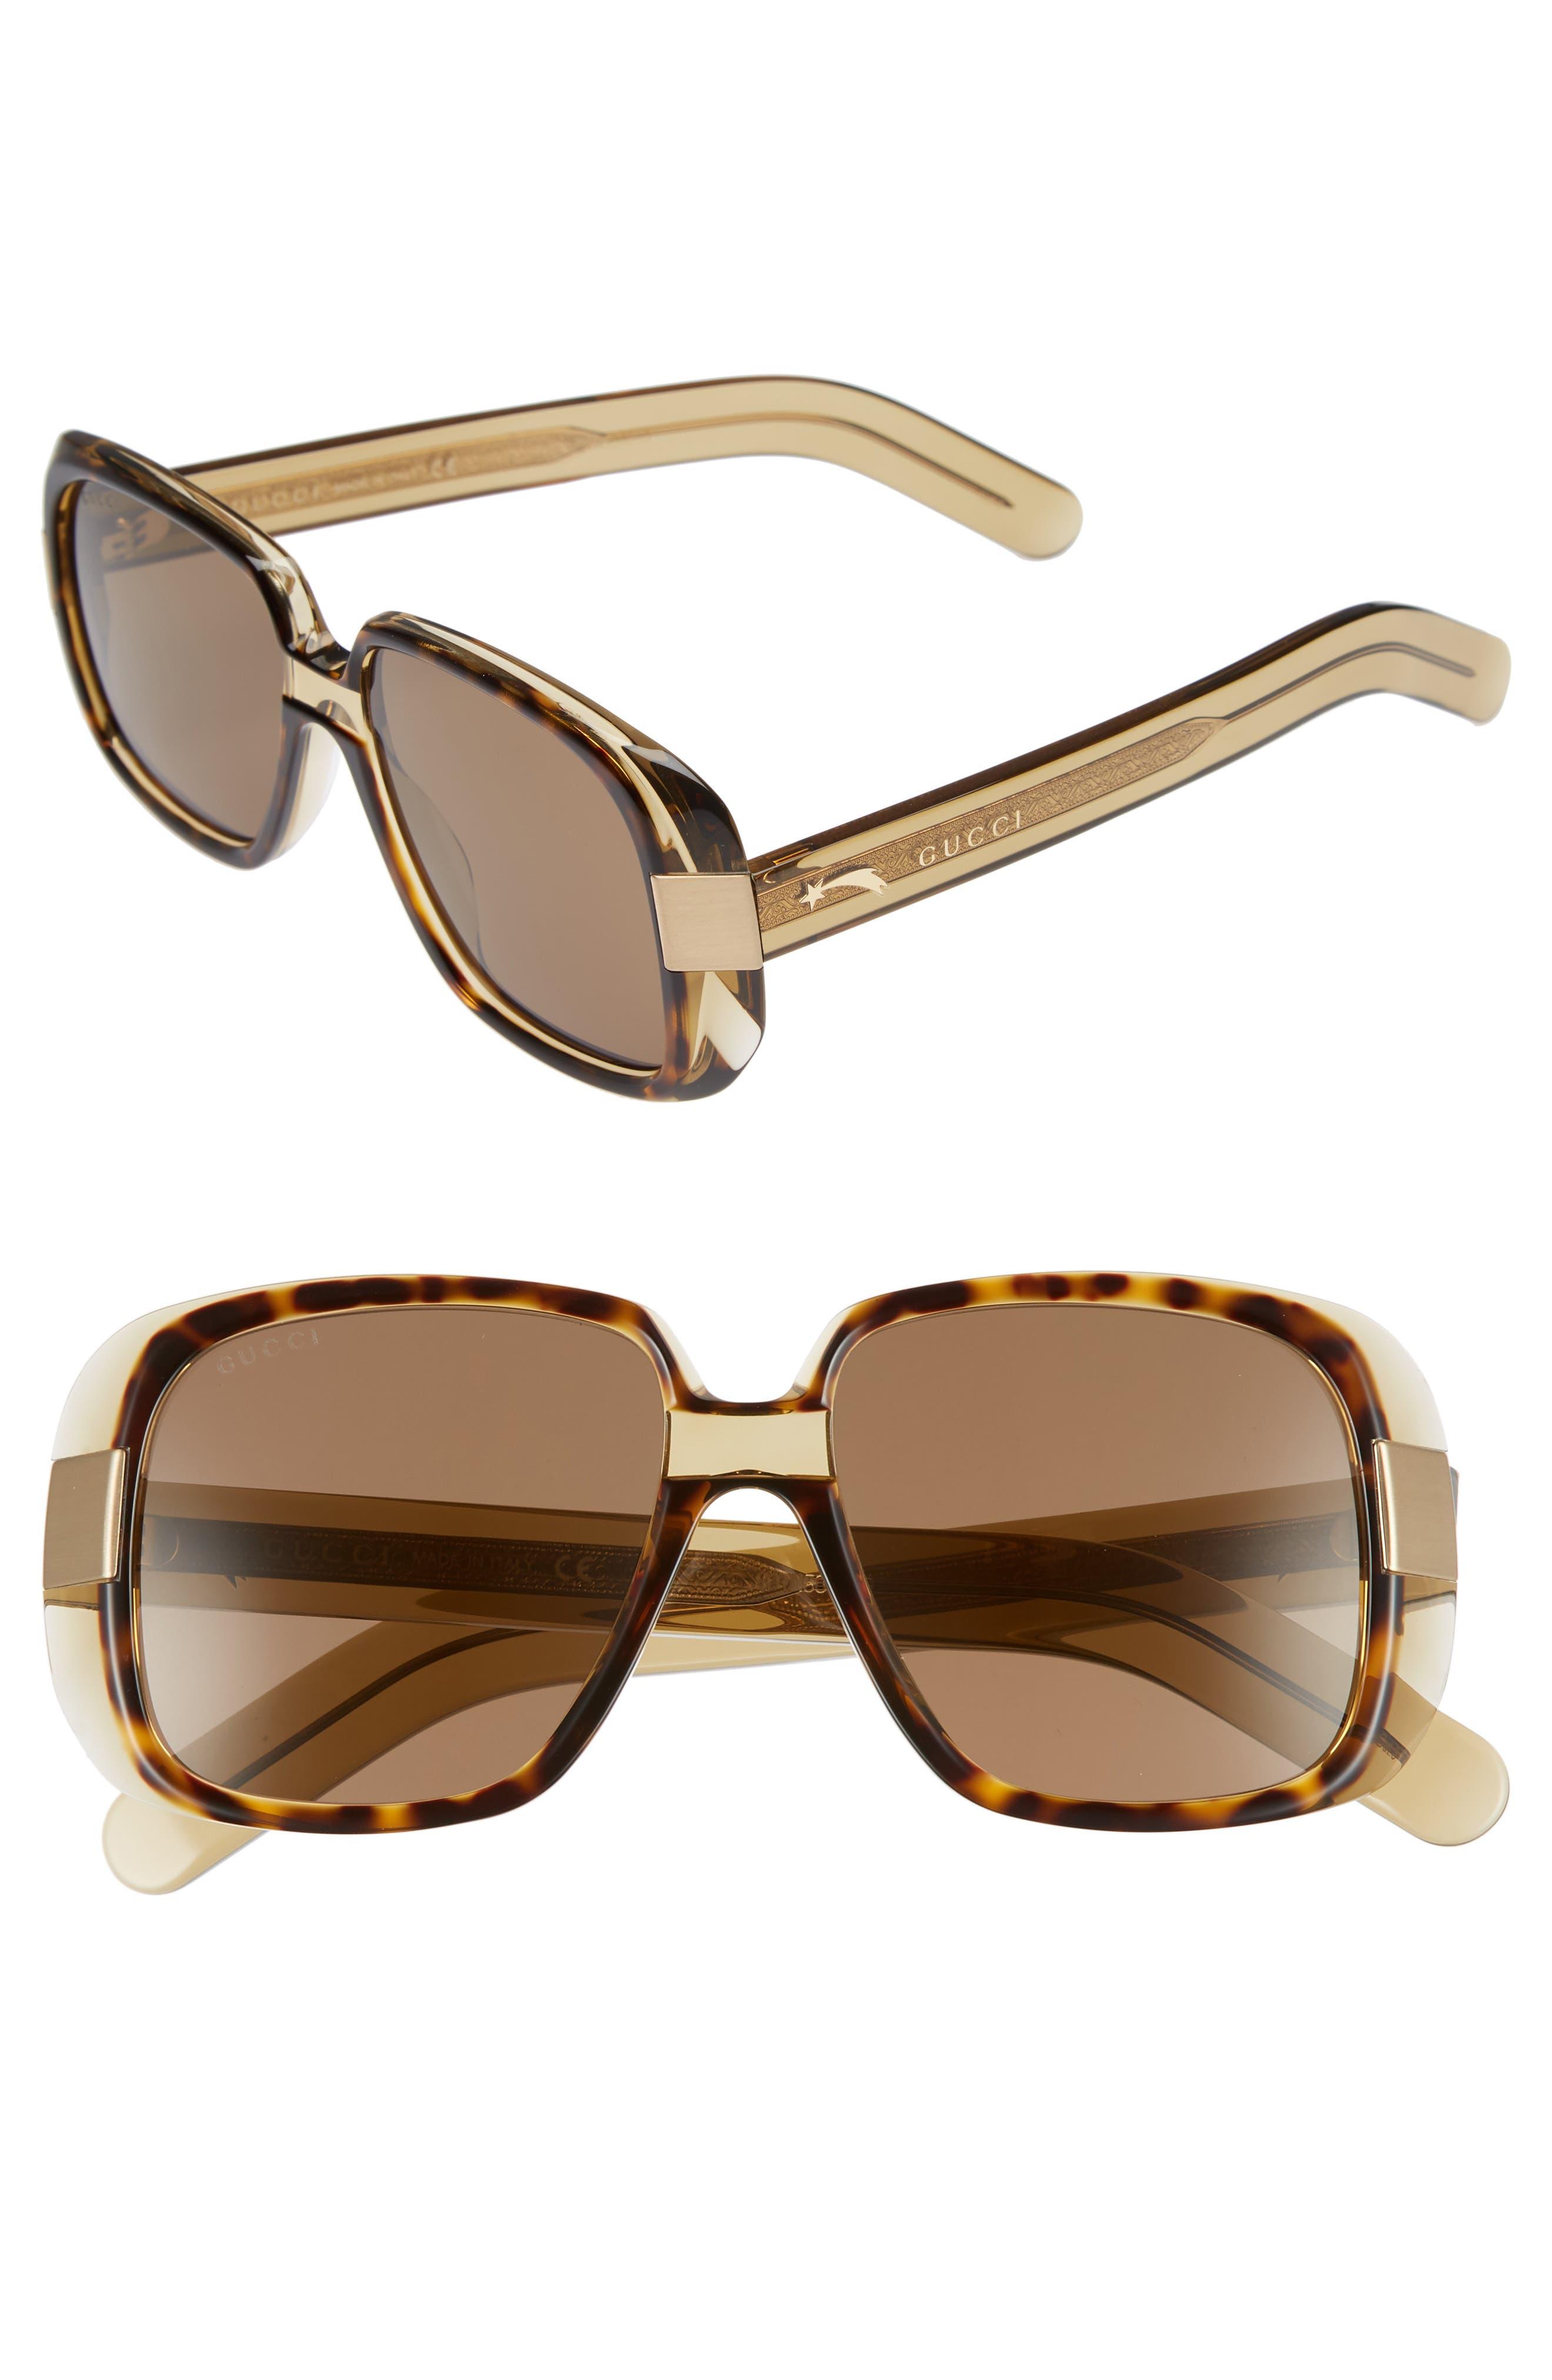 Cruise 51mm Square Sunglasses,                             Main thumbnail 1, color,                             Olive